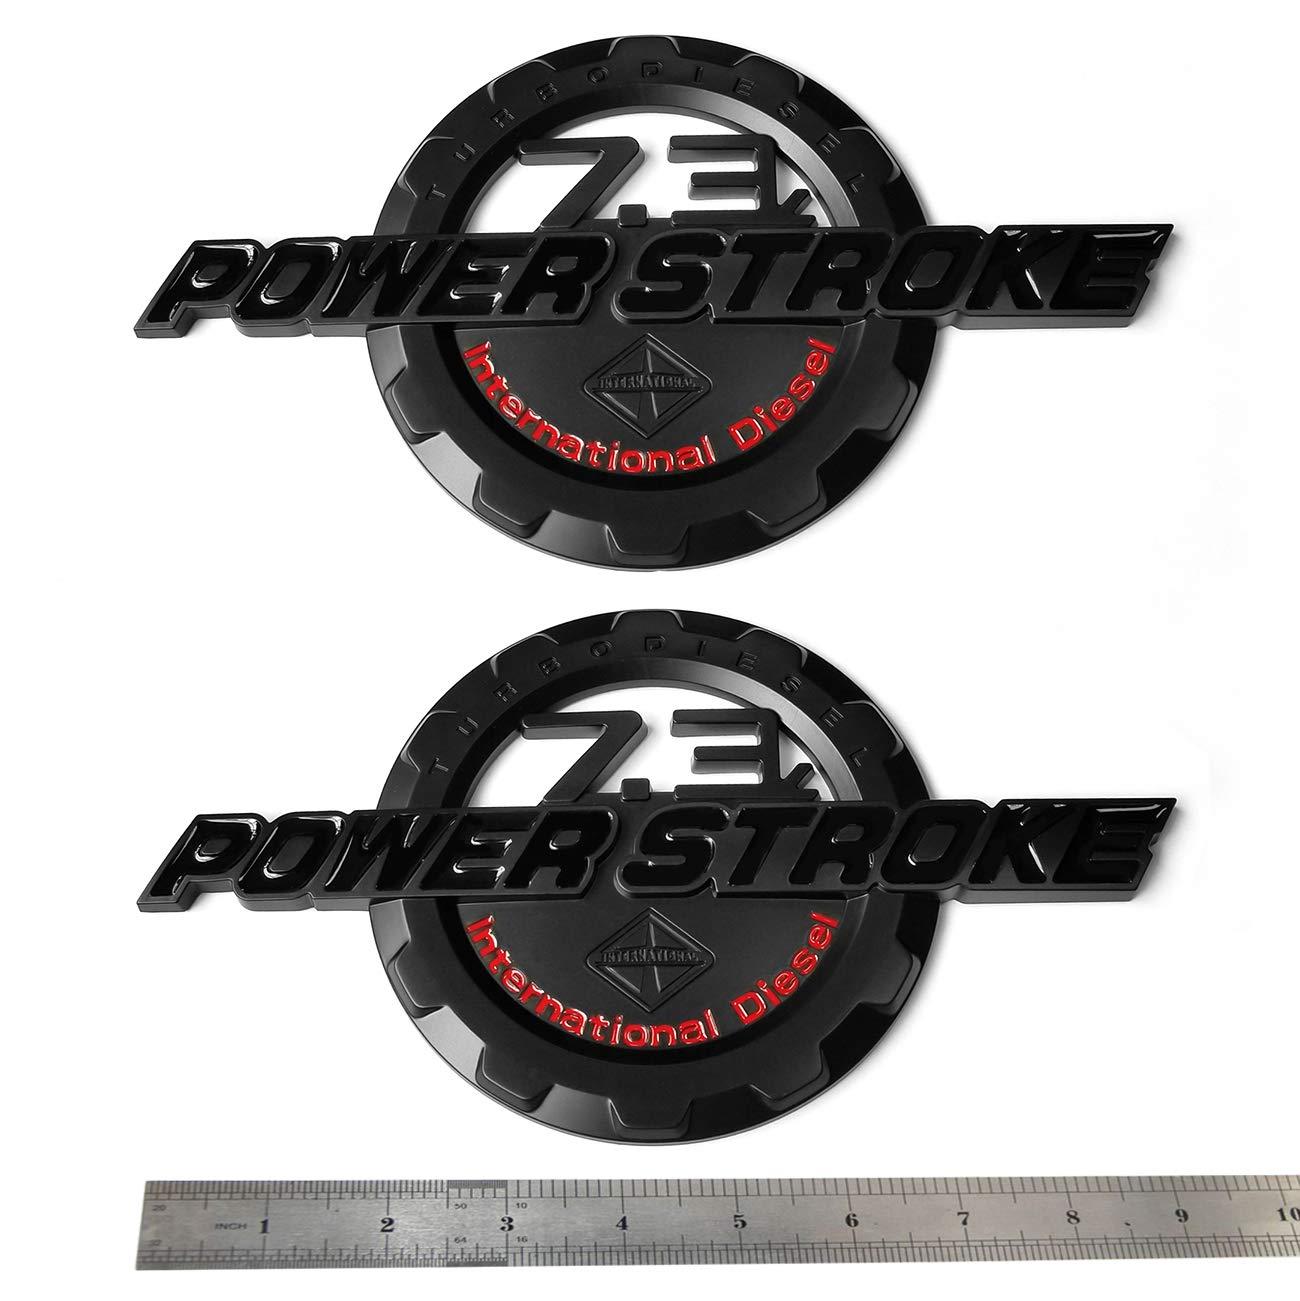 2x OEM Black Red 7.3L POWER STROKE International Side Fender Emblems Badge Powerstroke 3D logo Replacement for F250 F350